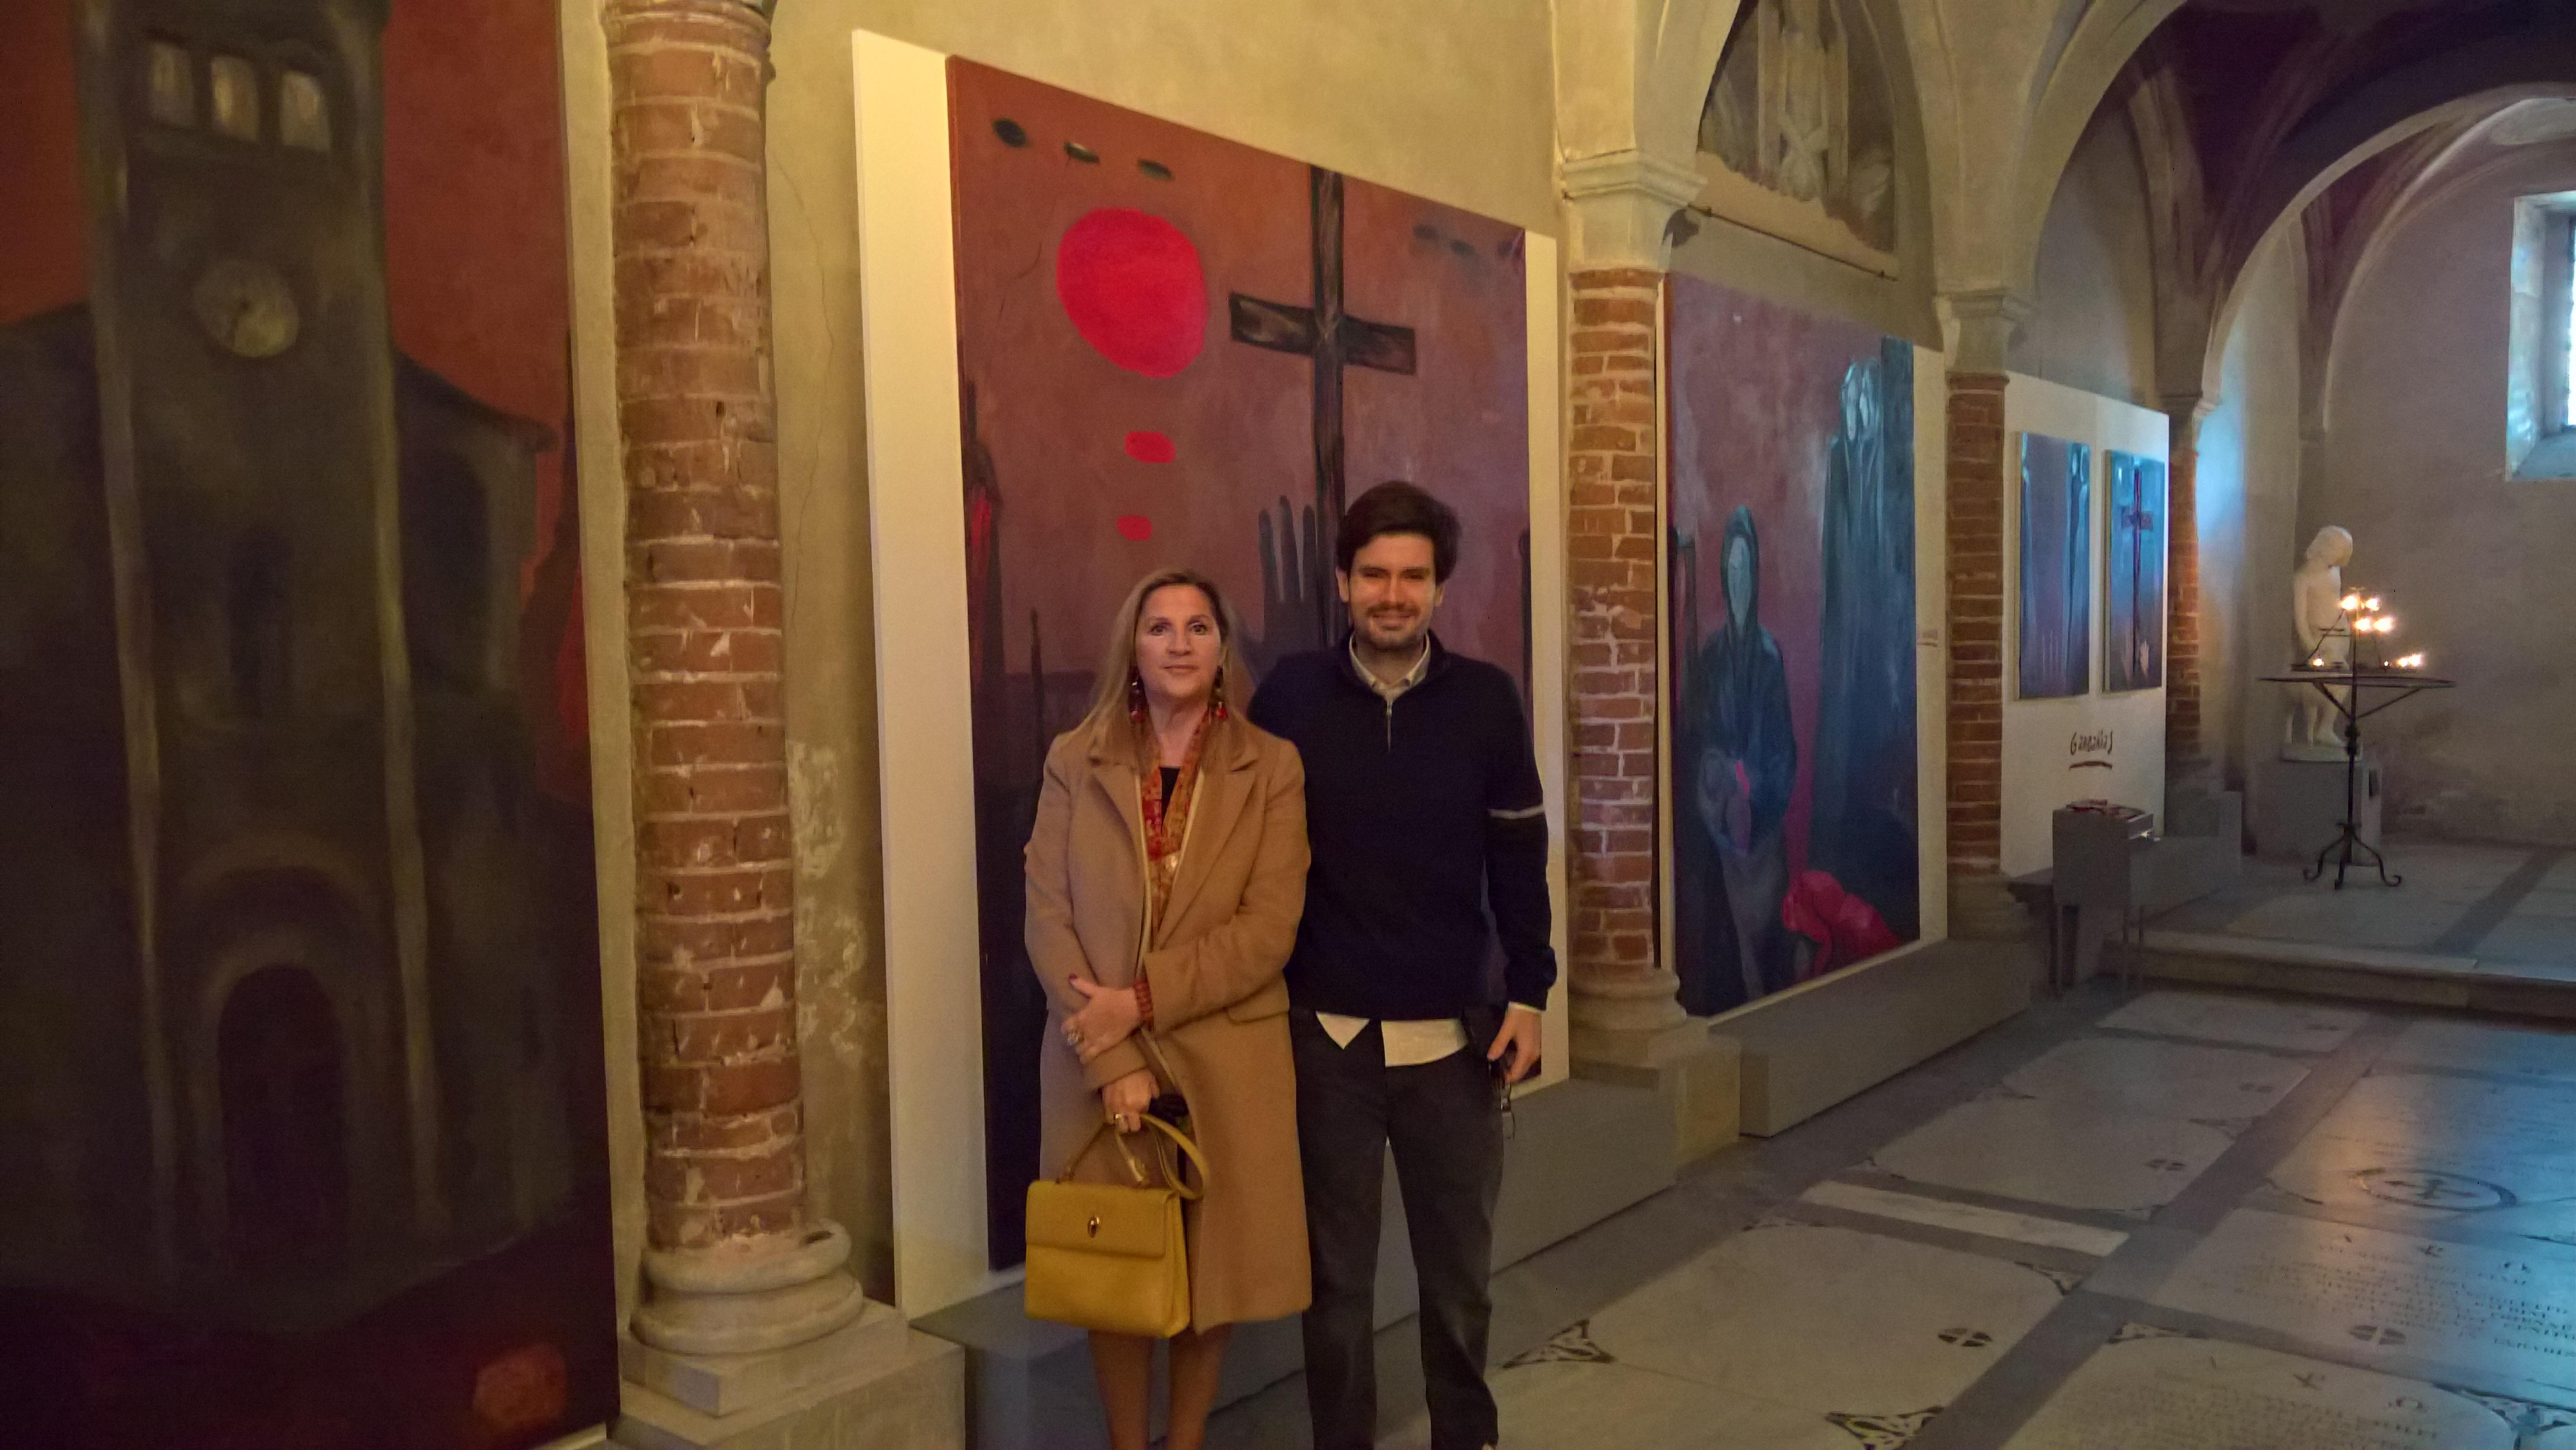 Firenze 10 Novembre 2018 - Alejandro Baron a Gernika